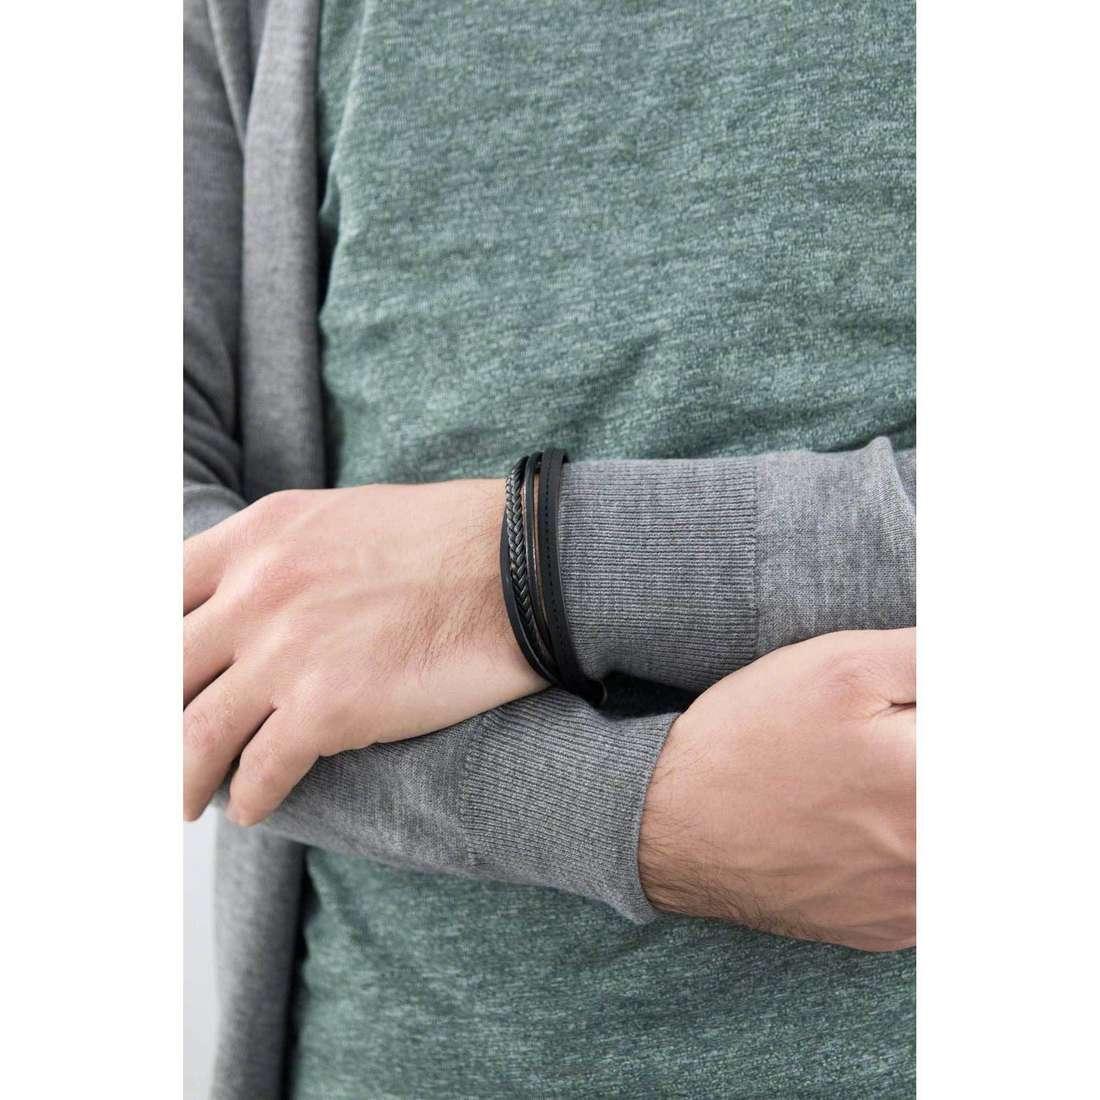 Morellato bracciali Vela uomo SAHC01 indosso